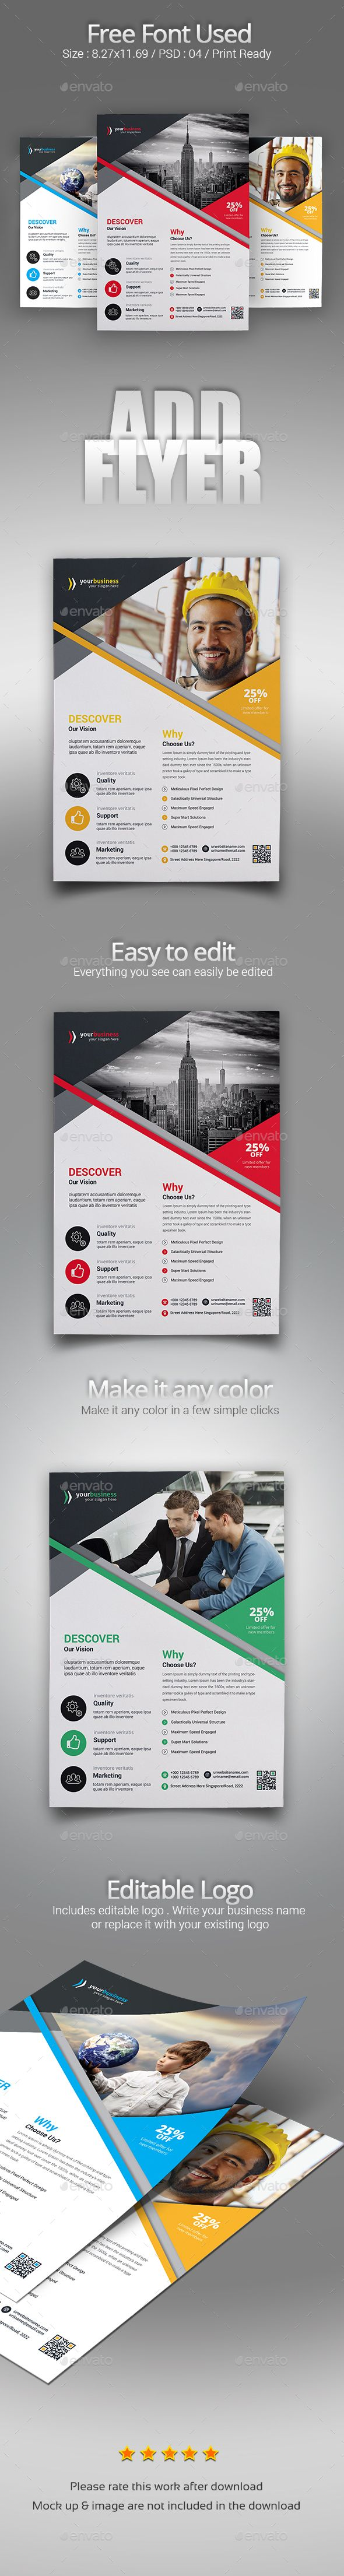 best images about brochure flyer inspiration flyer flyer design templatestemplates template